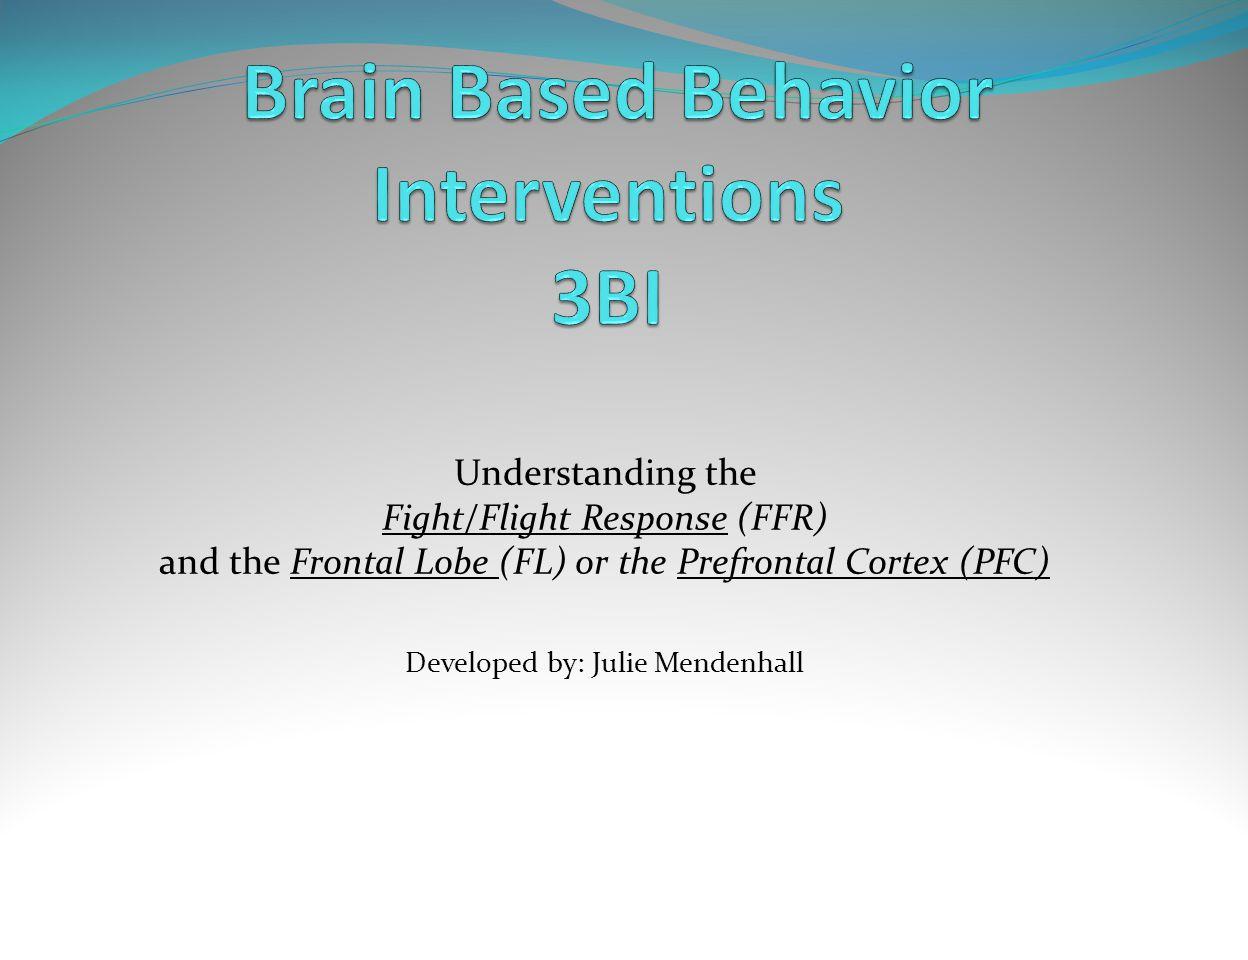 Brain Based Behavior Interventions 3BI